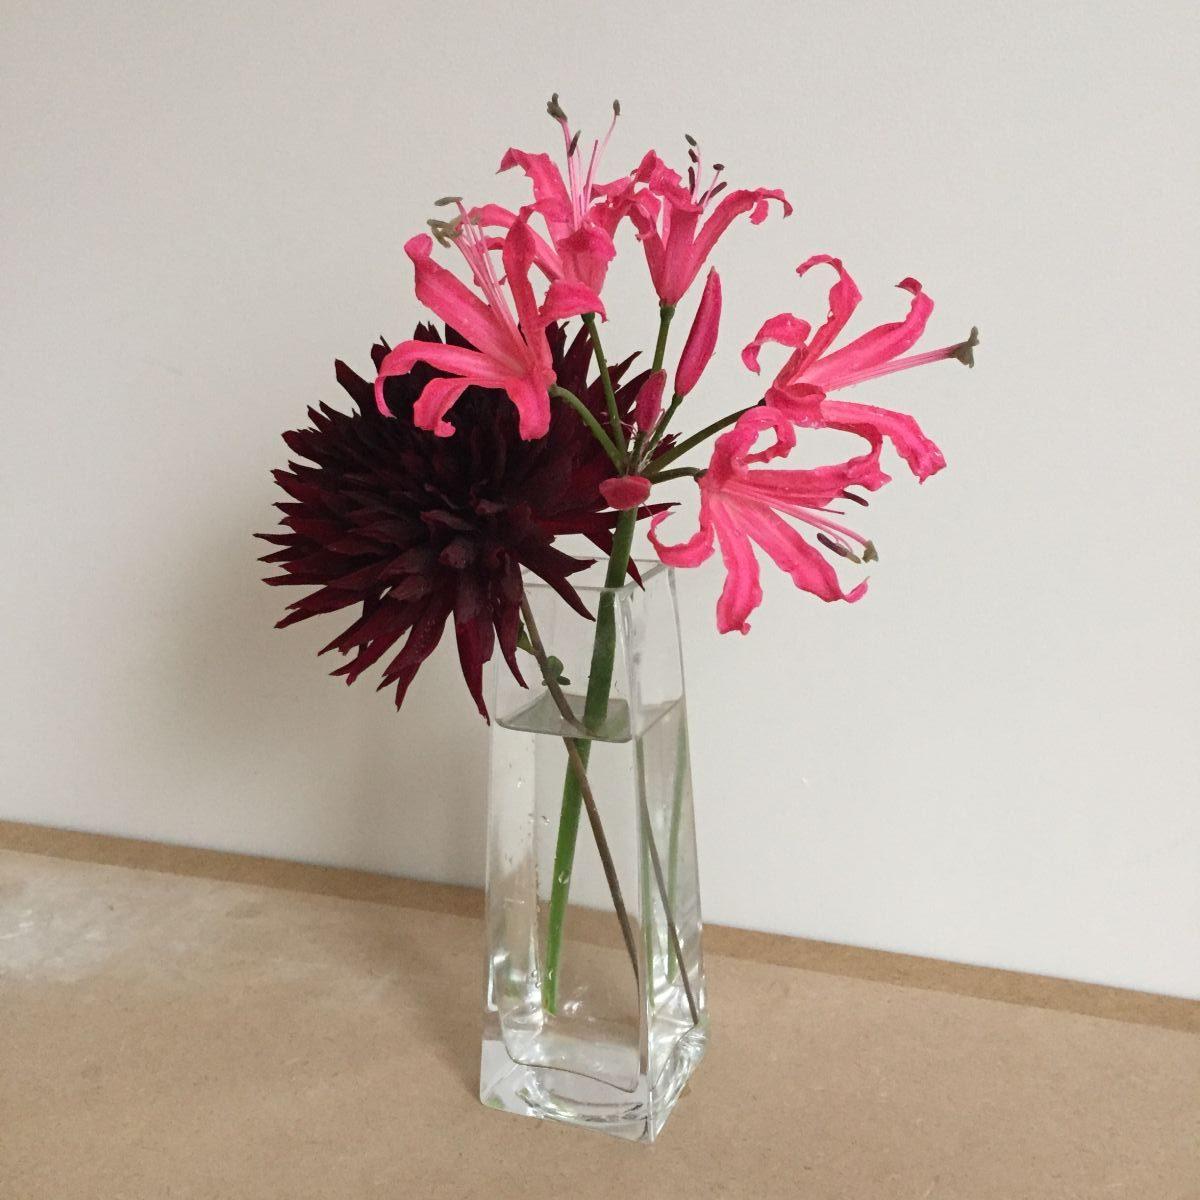 Dahlia, Nerine, cut flowers